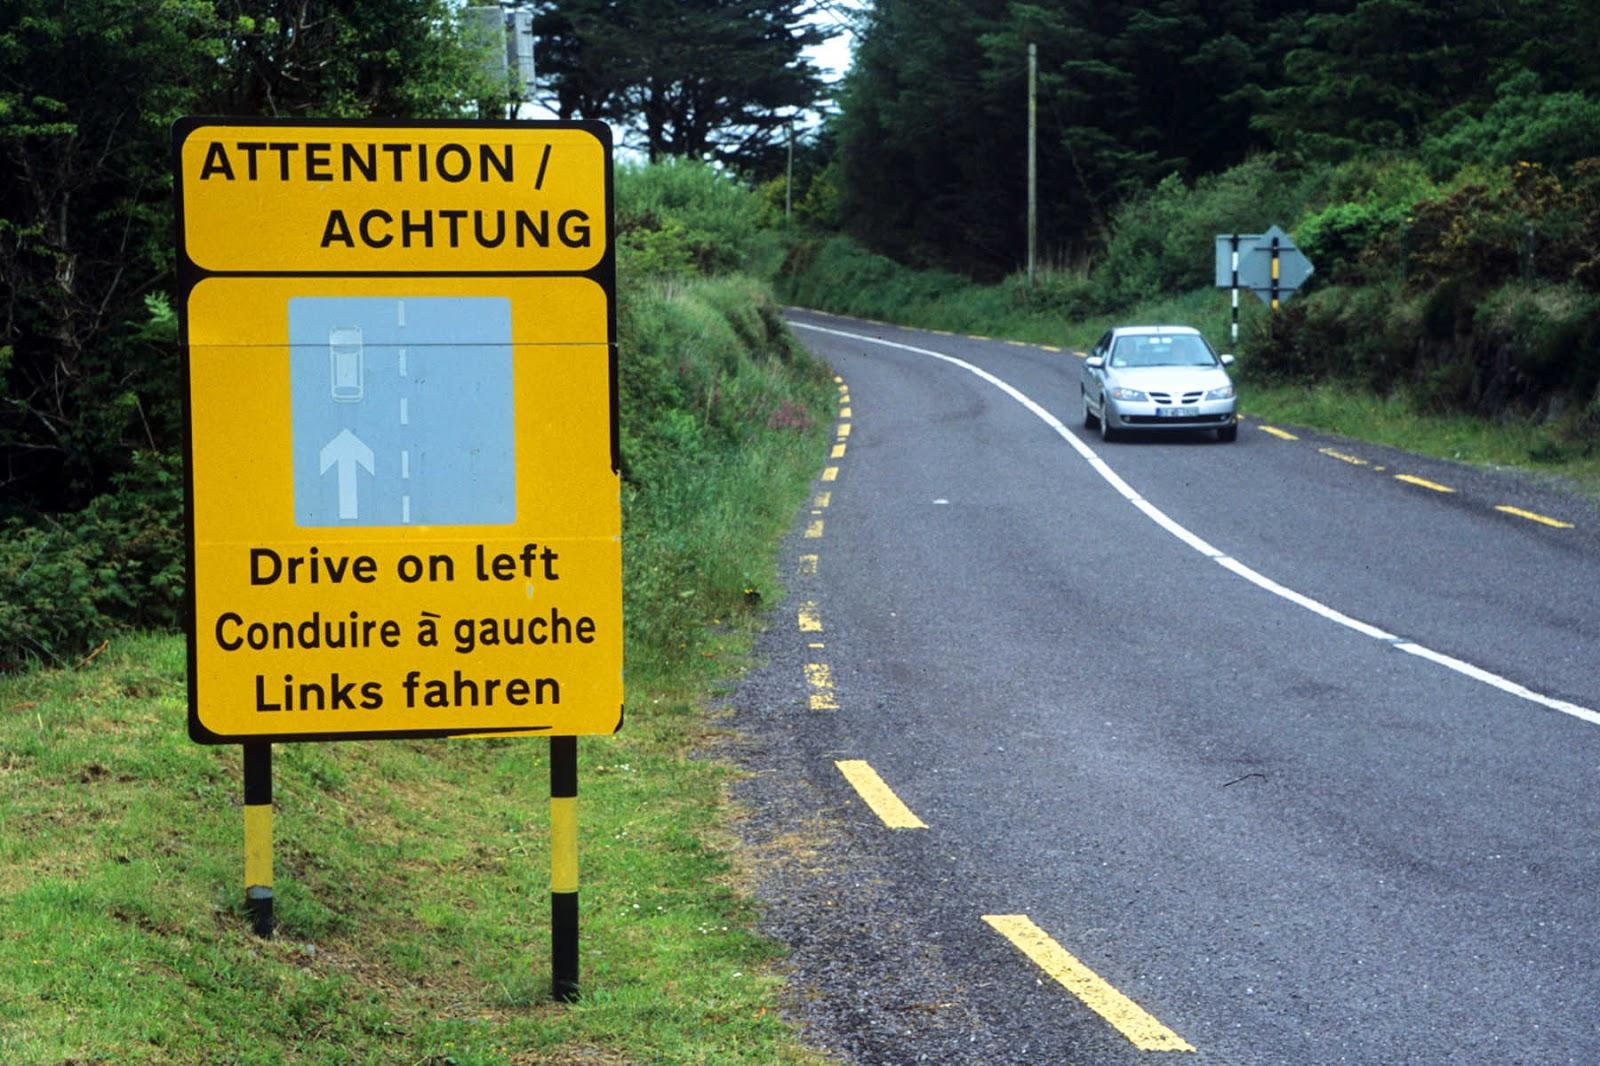 dirigir na irlanda